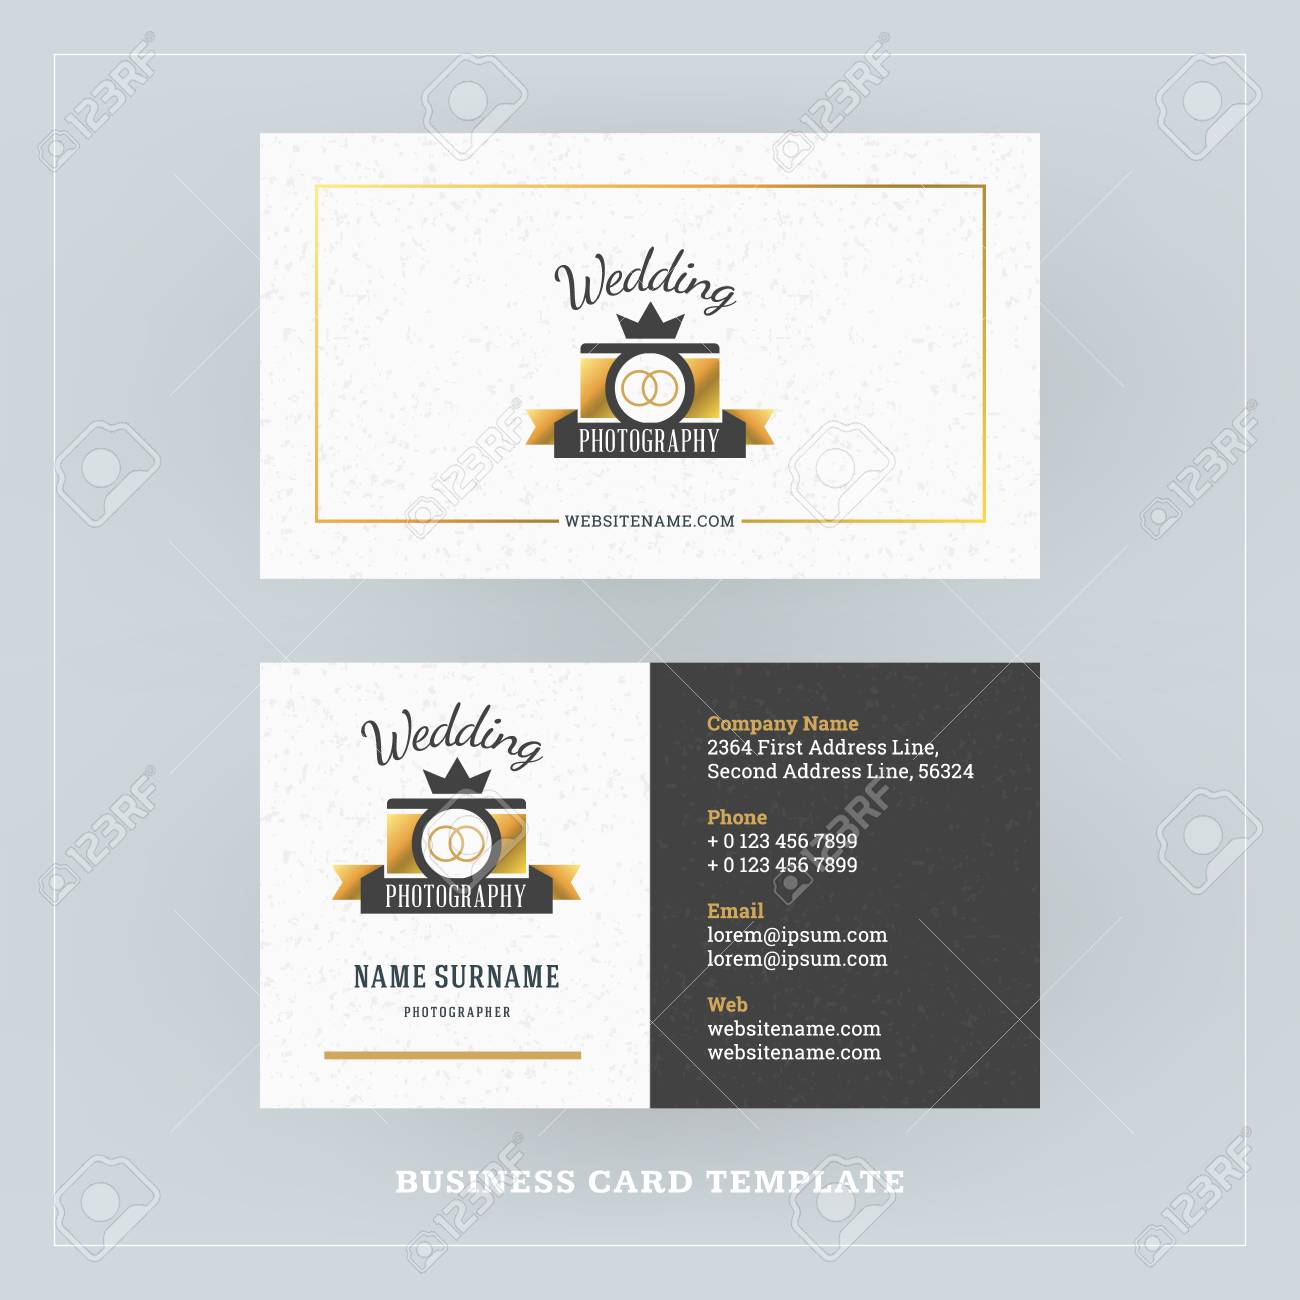 Golden and black business card design template business card golden and black business card design template business card for photographer or graphic designer colourmoves